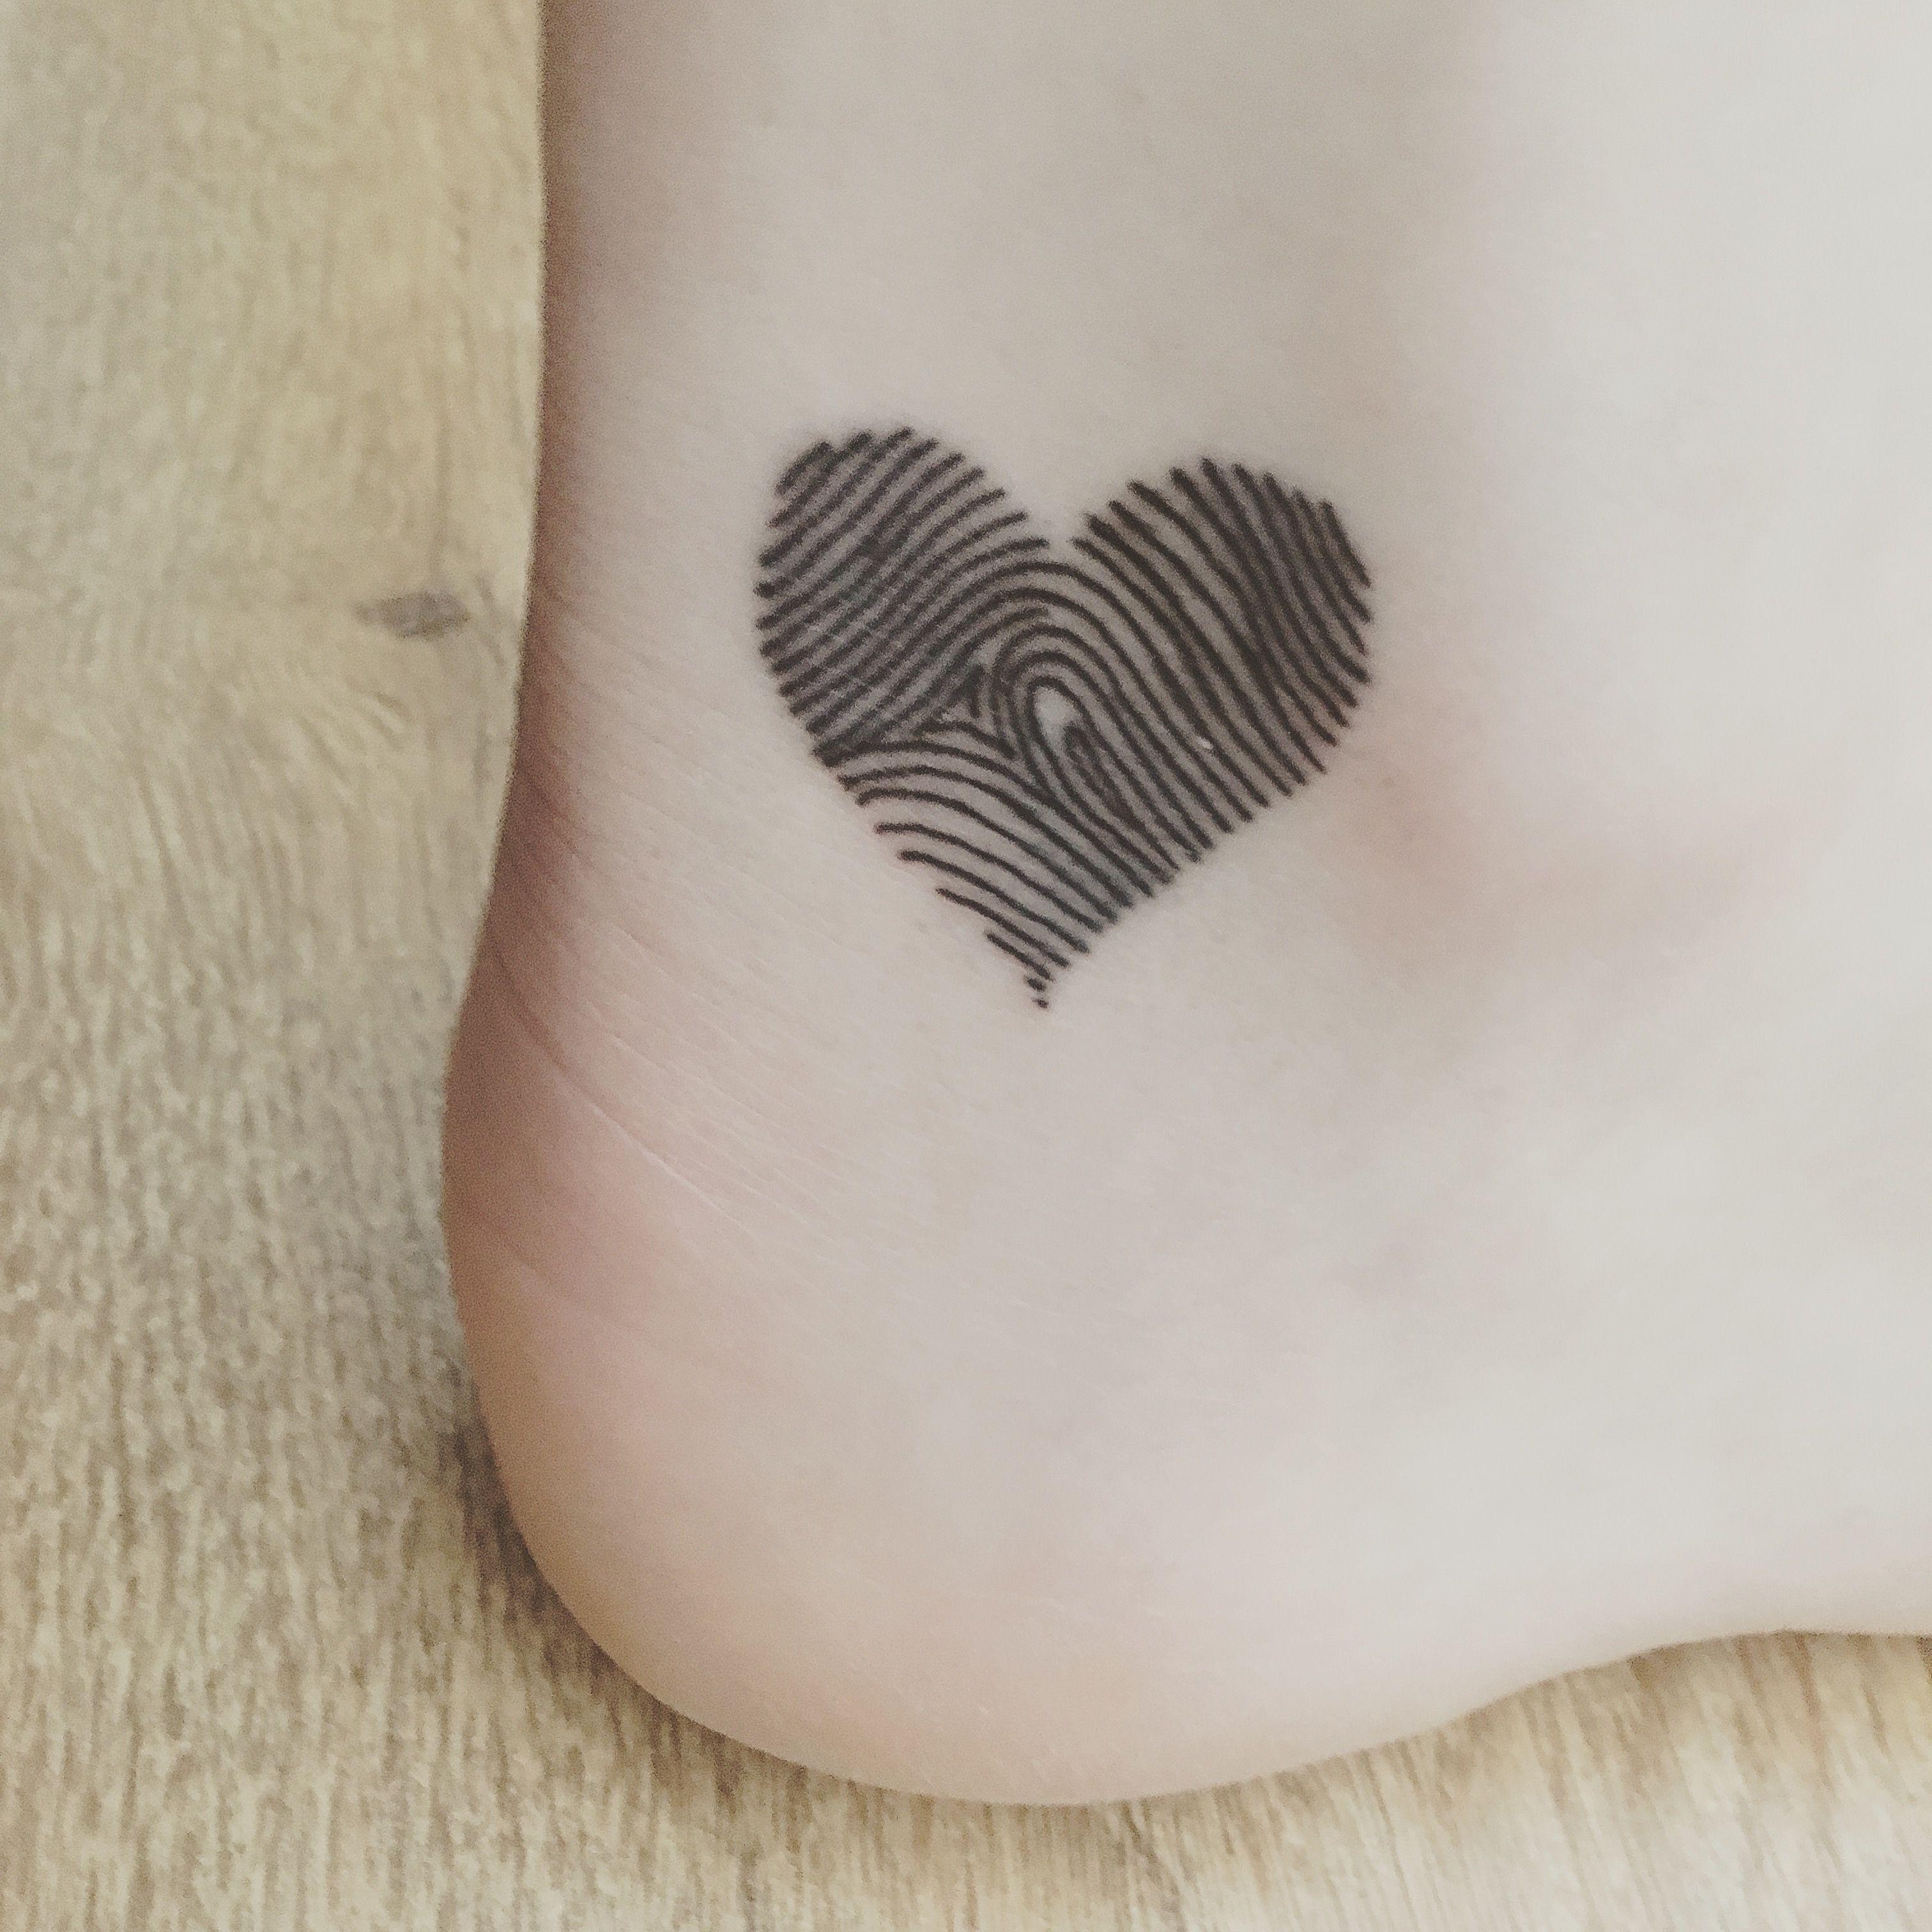 heart shaped fingerprint tattoo tattoo ideas. Black Bedroom Furniture Sets. Home Design Ideas